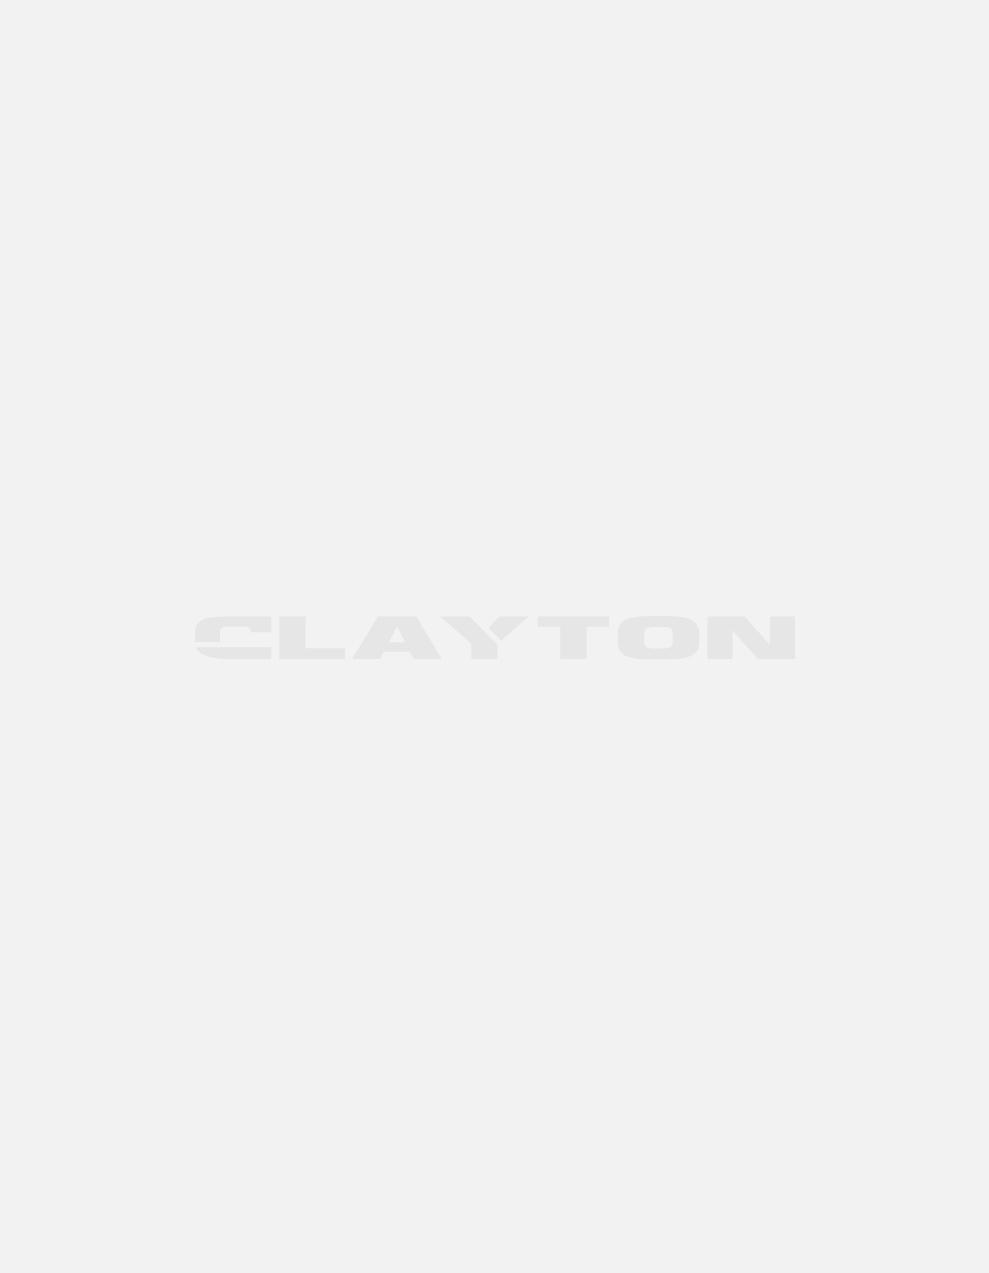 https://www.claytonitalia.com/media/catalog/product/cache/5/small_image/460x590/9df78eab33525d08d6e5fb8d27136e95/2/0/20.jpg